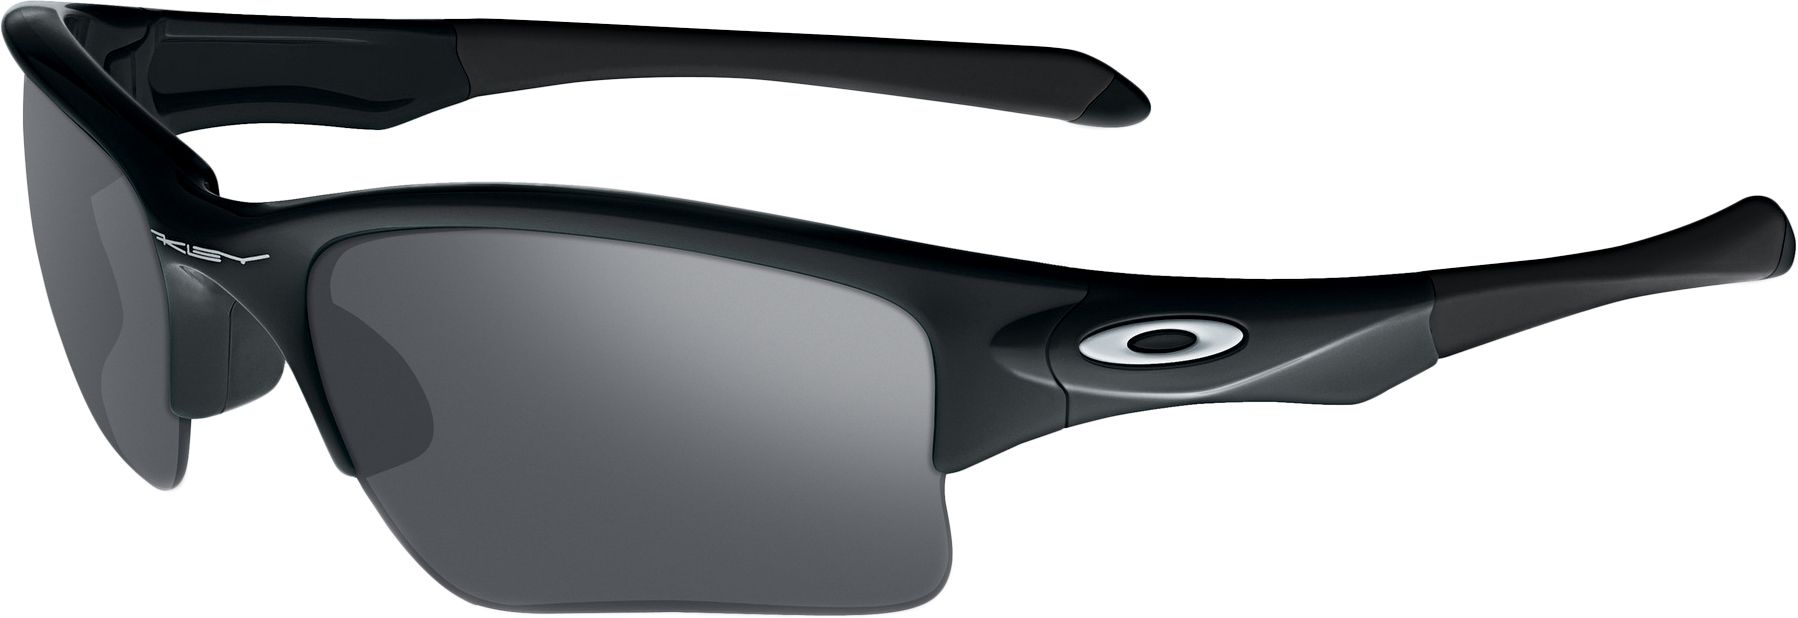 oakley junior cricket sunglasses